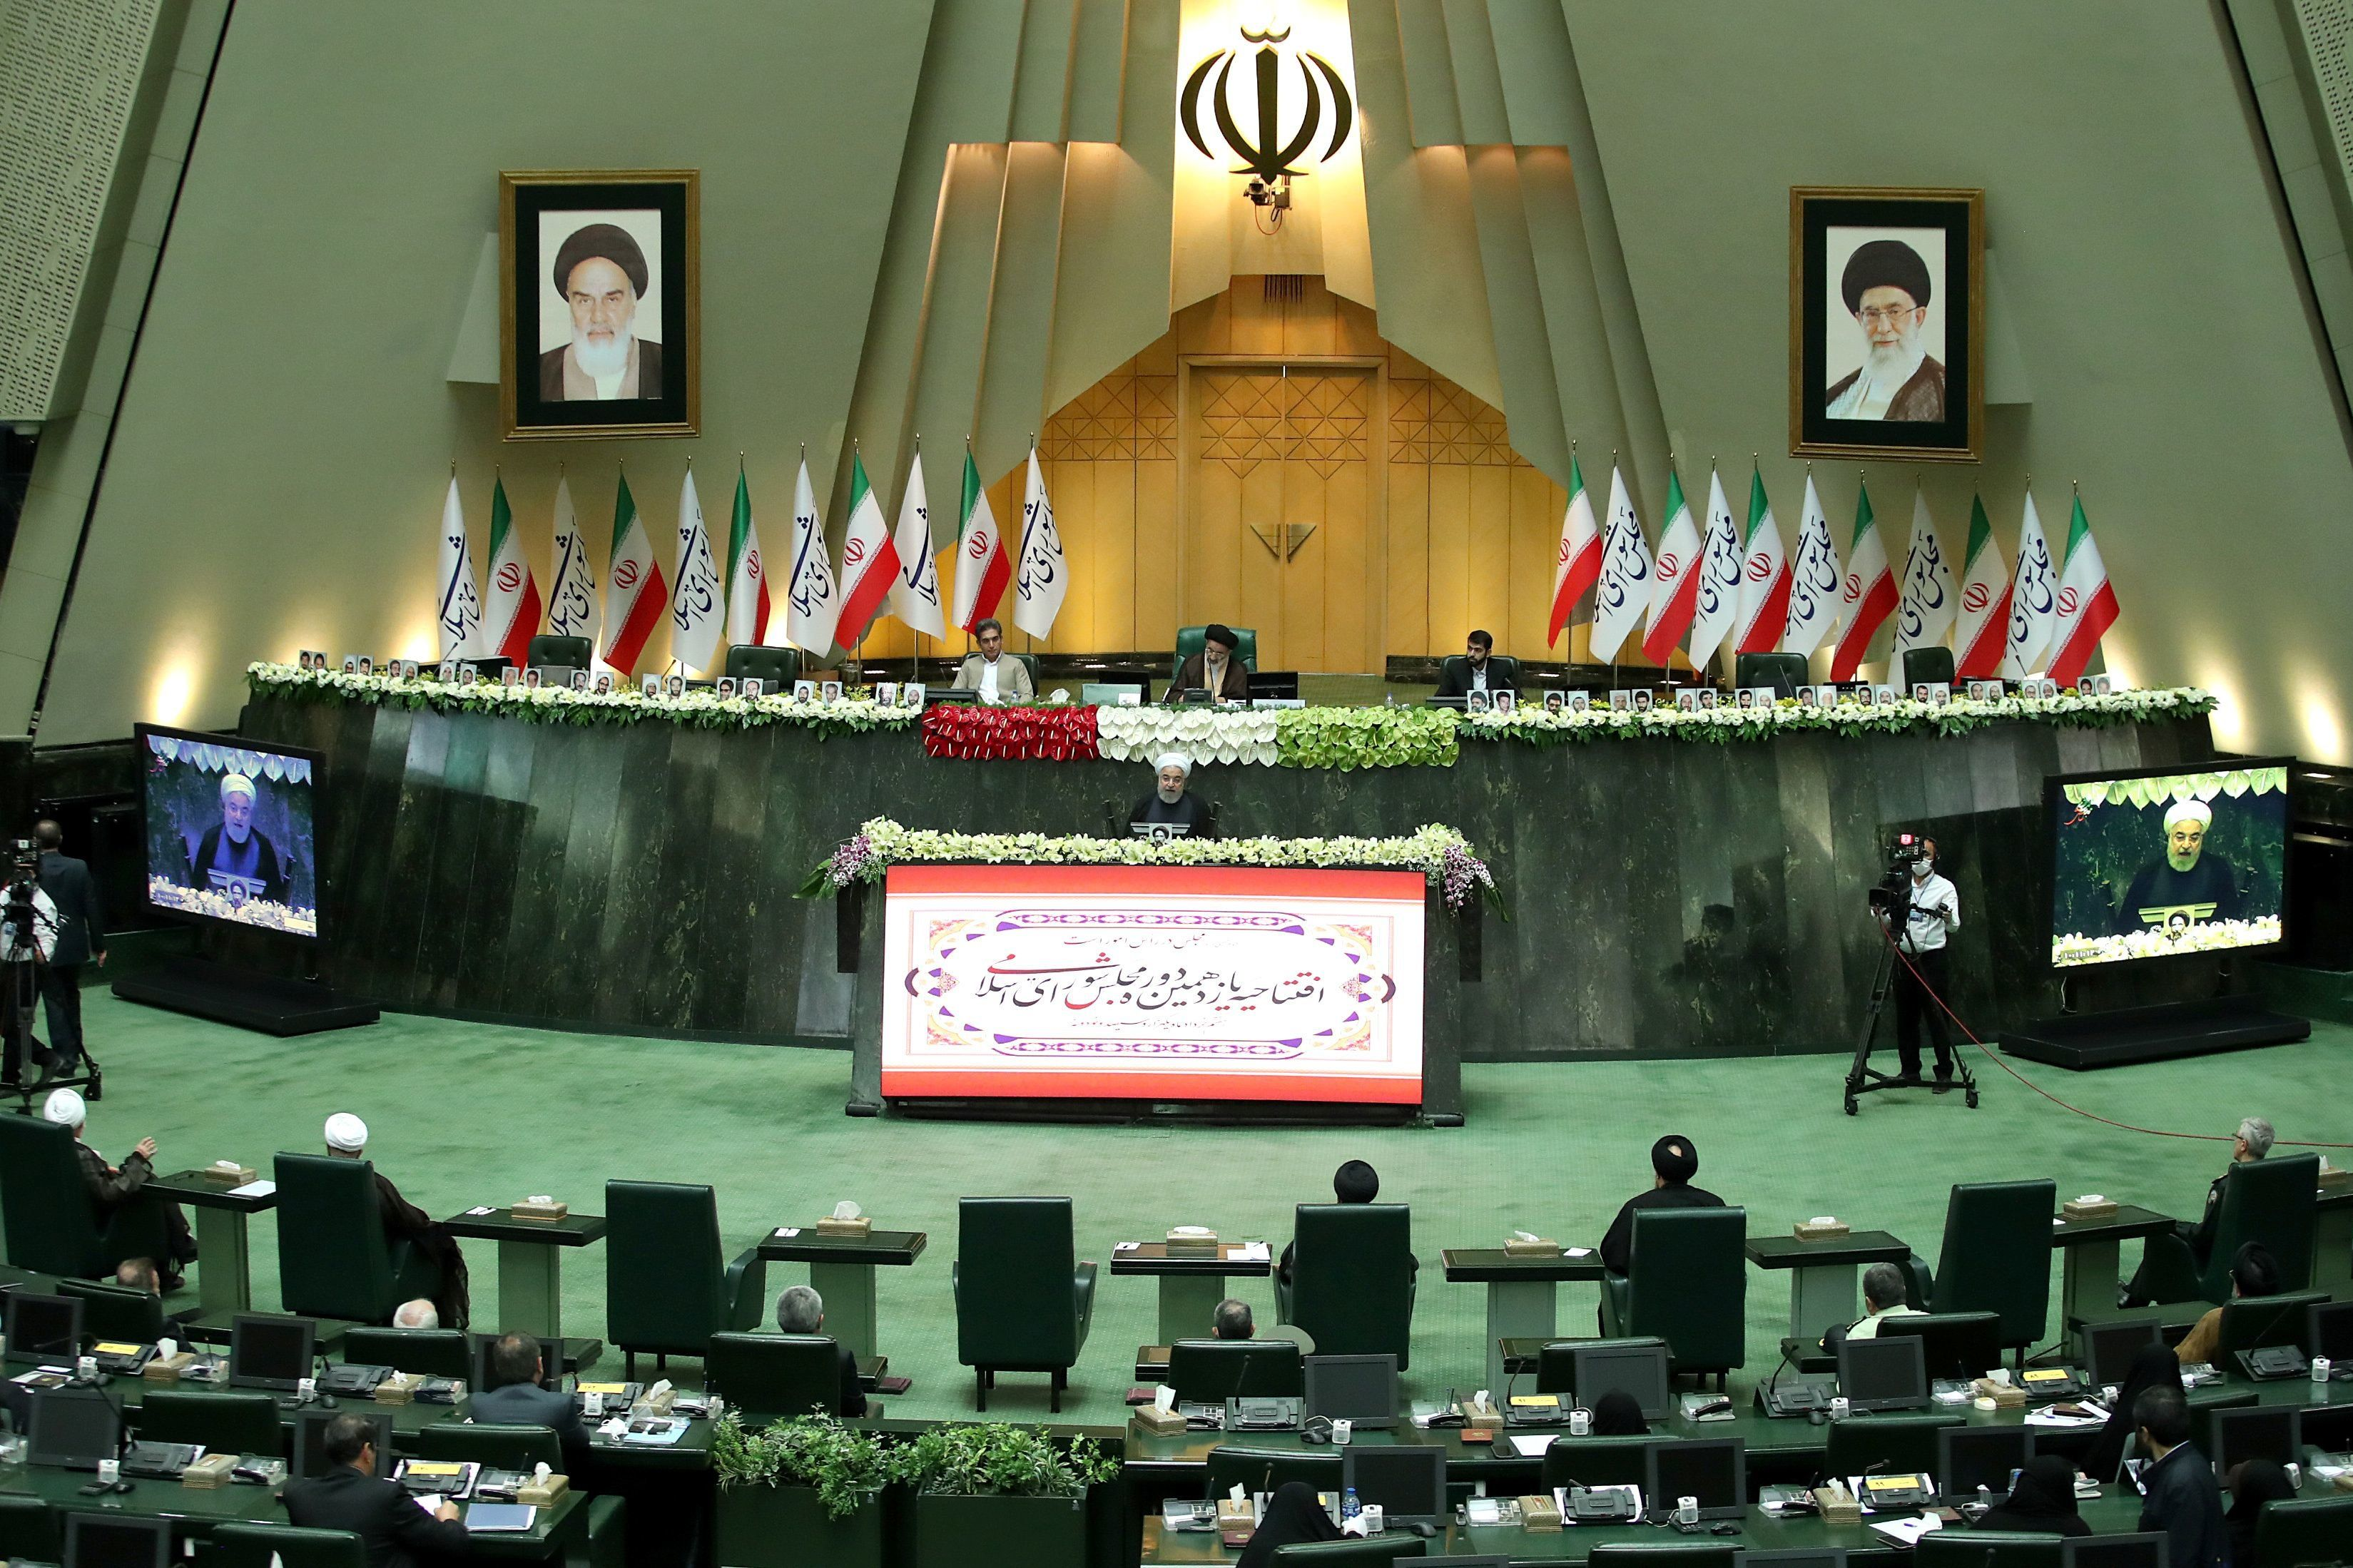 Coronavirus Politics Daily: Iran's parliament convenes, Americas become epicenter, India lifts lockdown